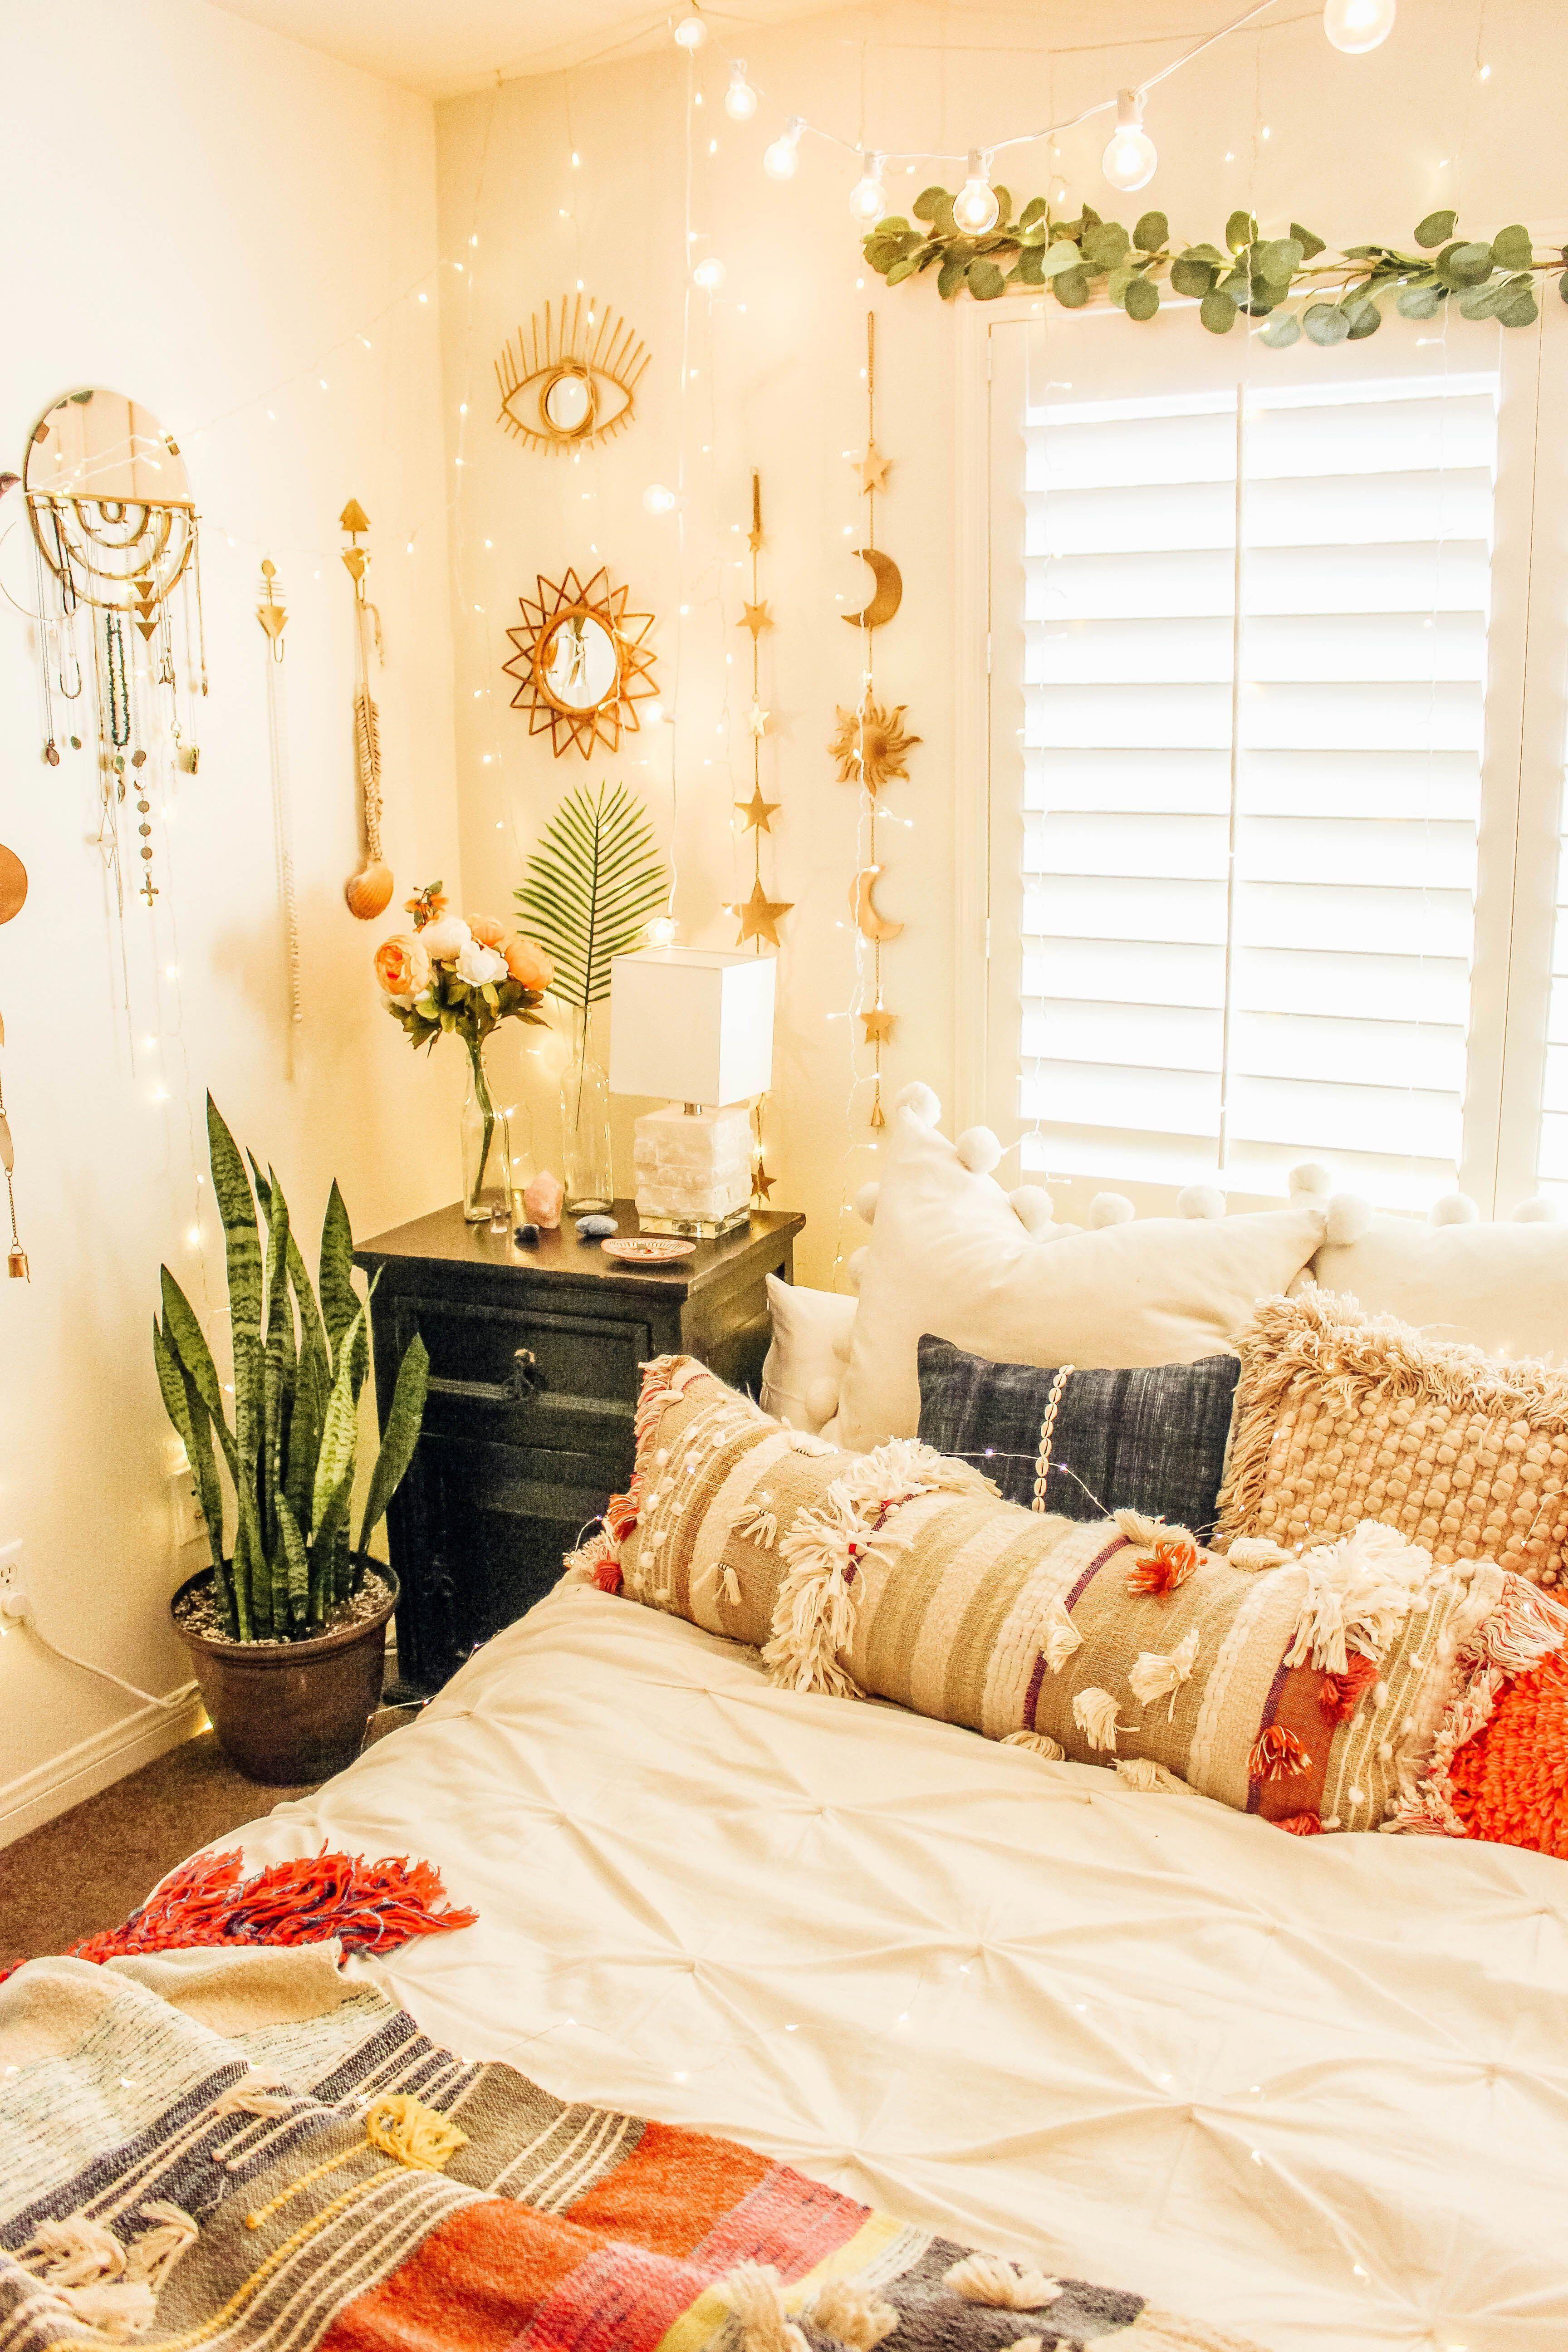 13+ Hanging bedroom decor ideas in 2021